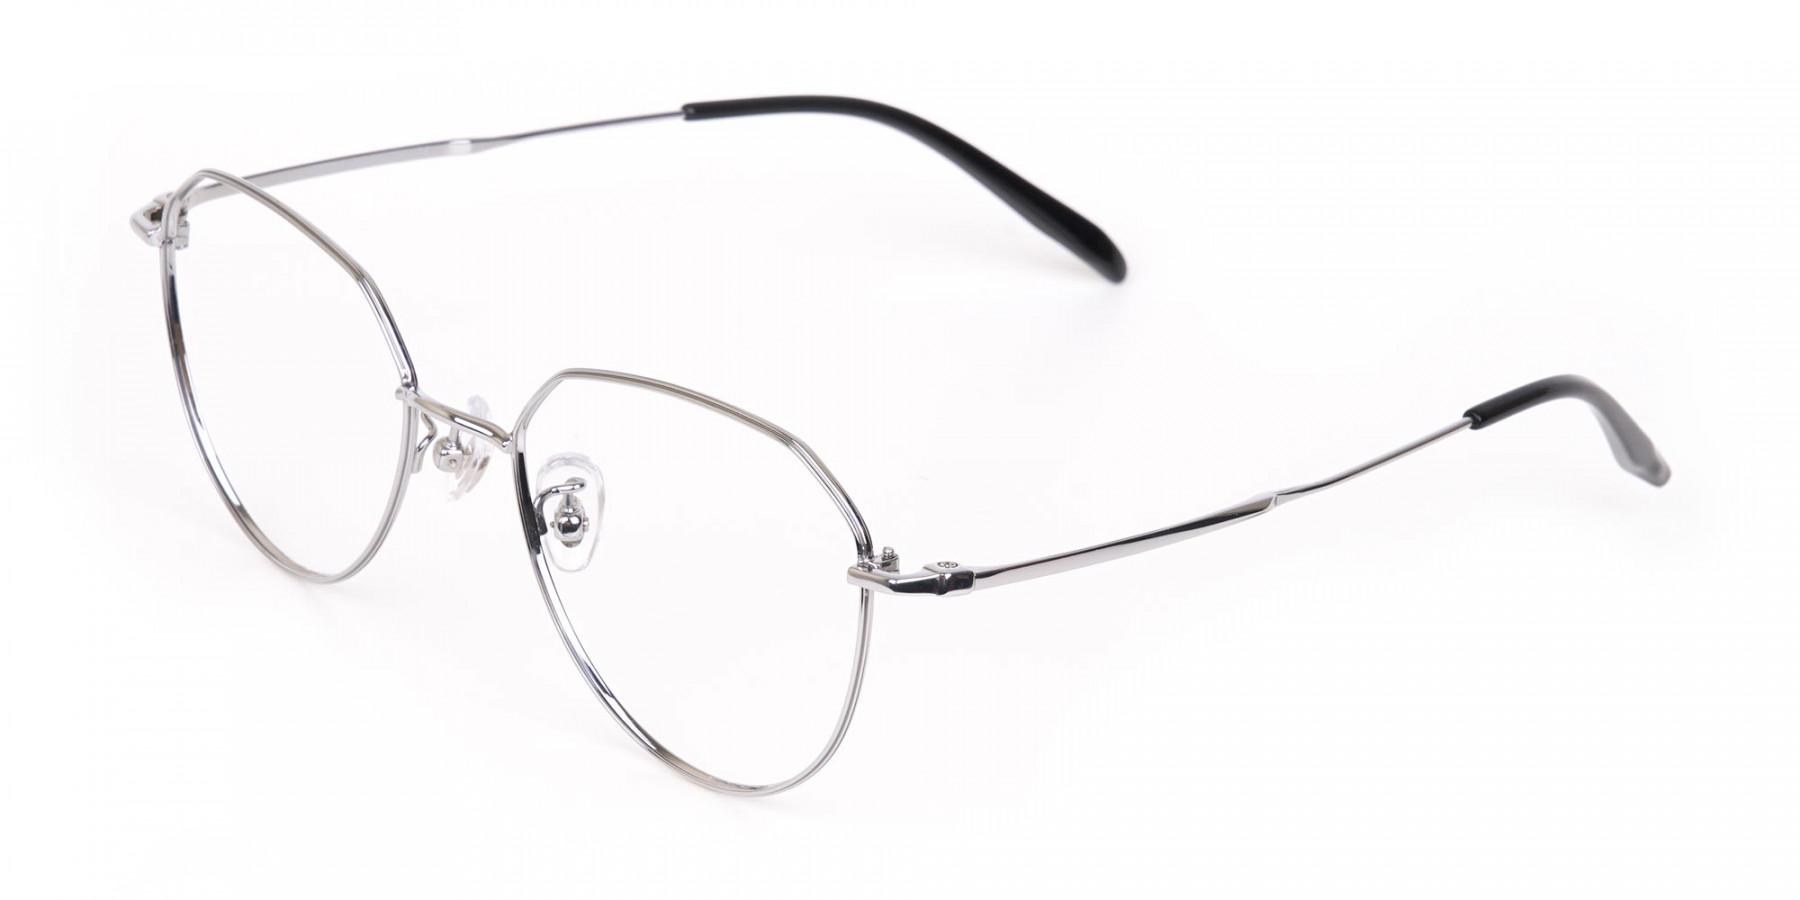 Silver Metal Aviator Glasses Frame Unisex-1